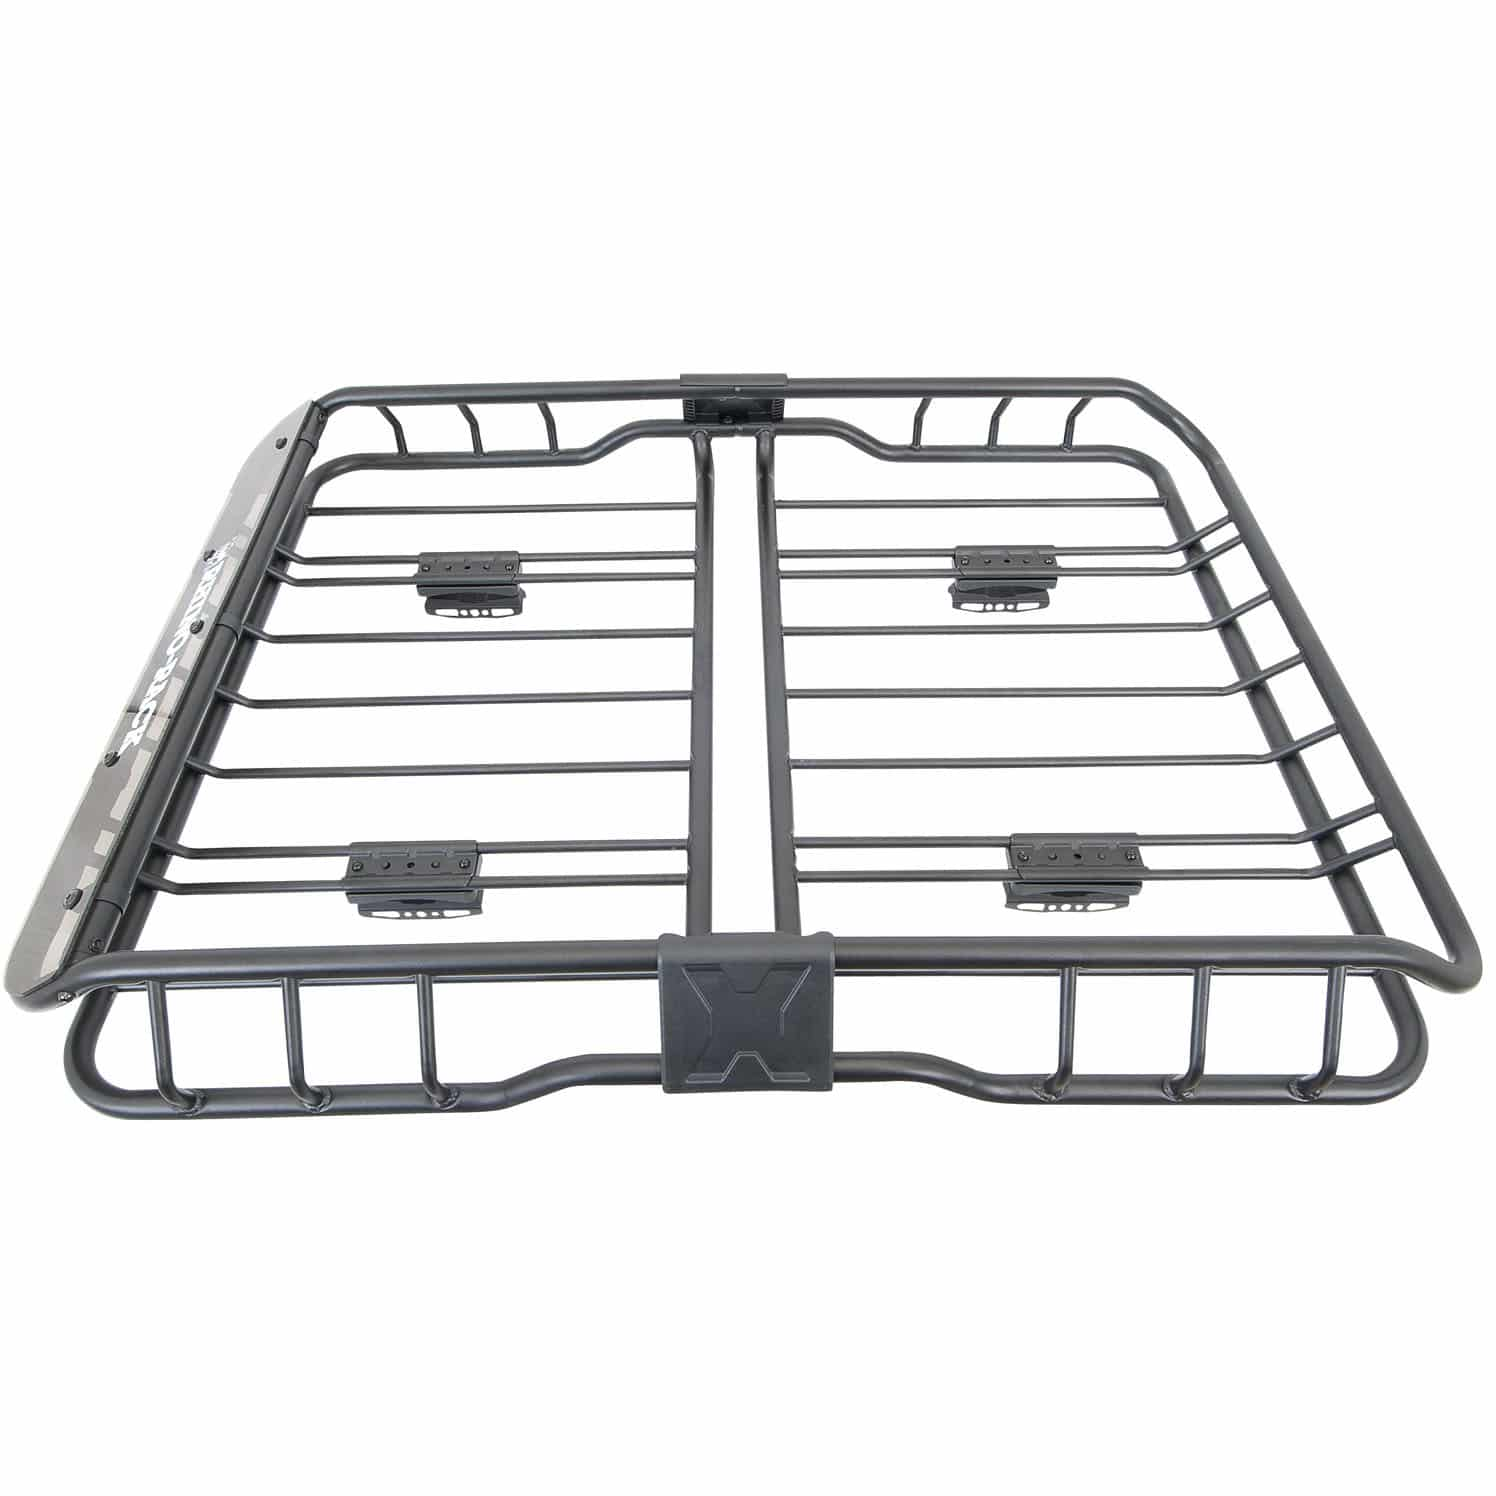 Rhino Rack Xtray Small - Side Top View